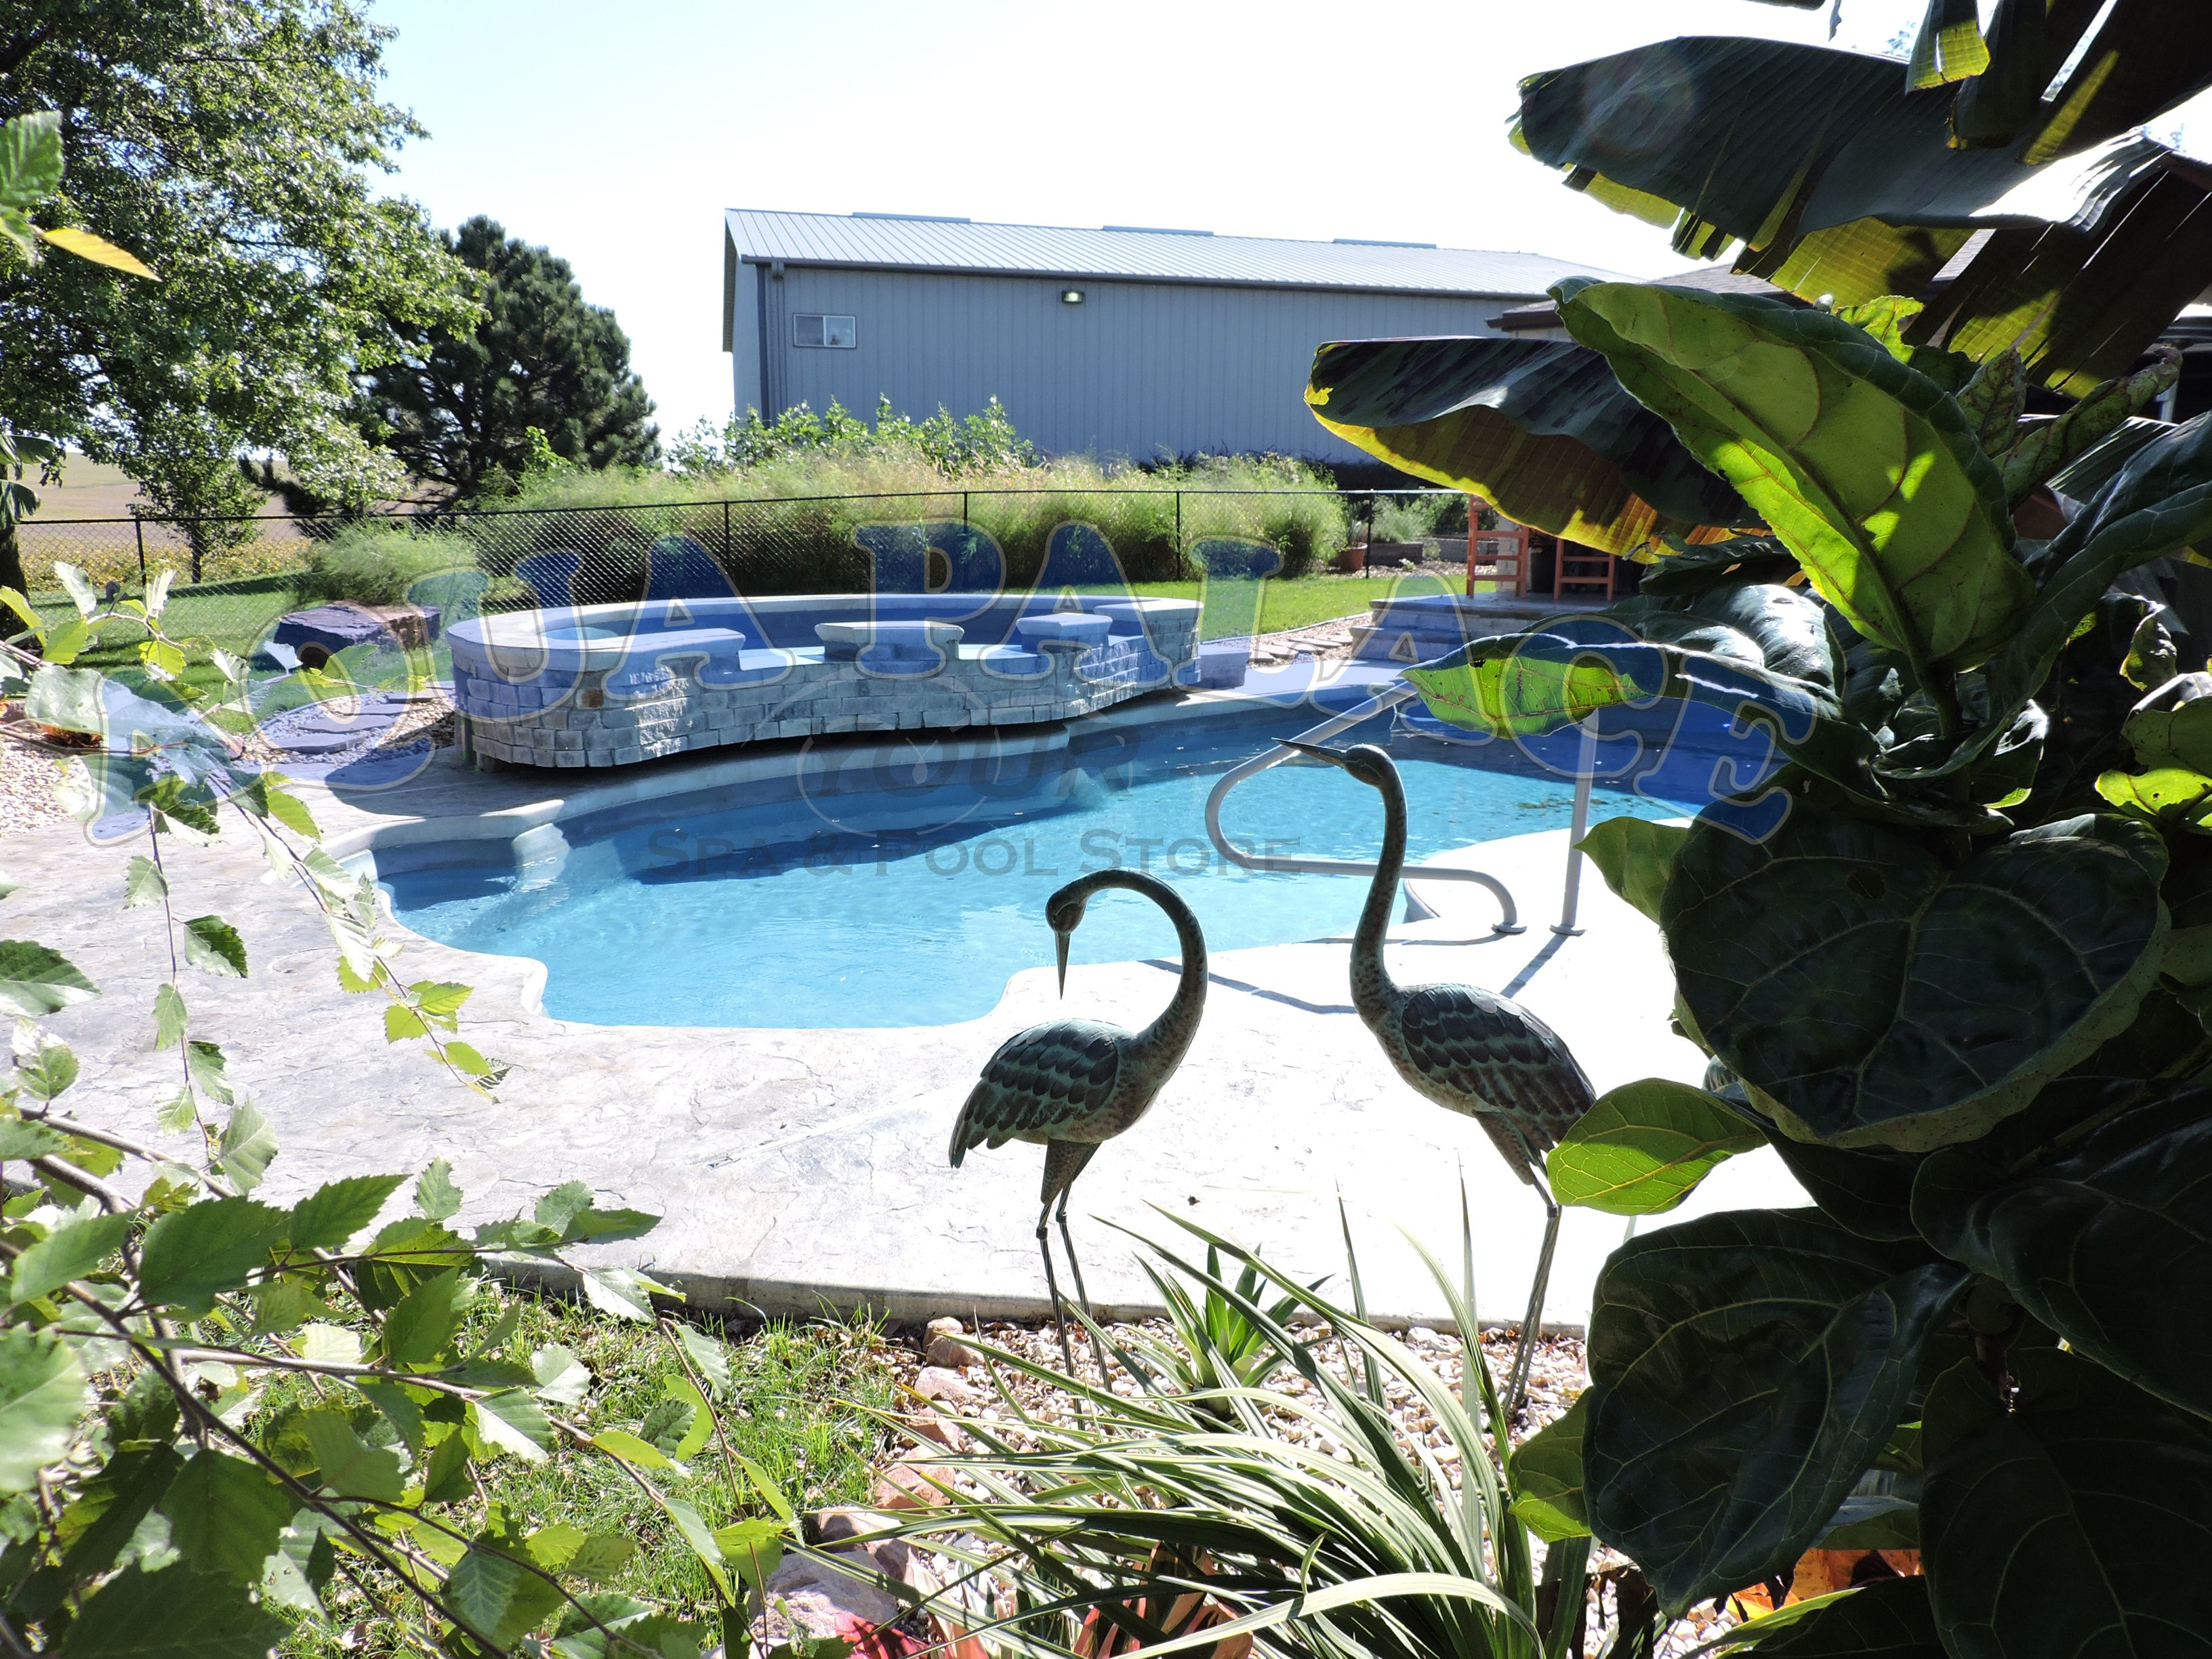 Fiberglass Pool With Fiberglass Spill Over Water Feature Custom Auto Cover Auto Cover Bench Aqua Palace 712 329 4180 Pool Fiberglass Pools Pool Designs